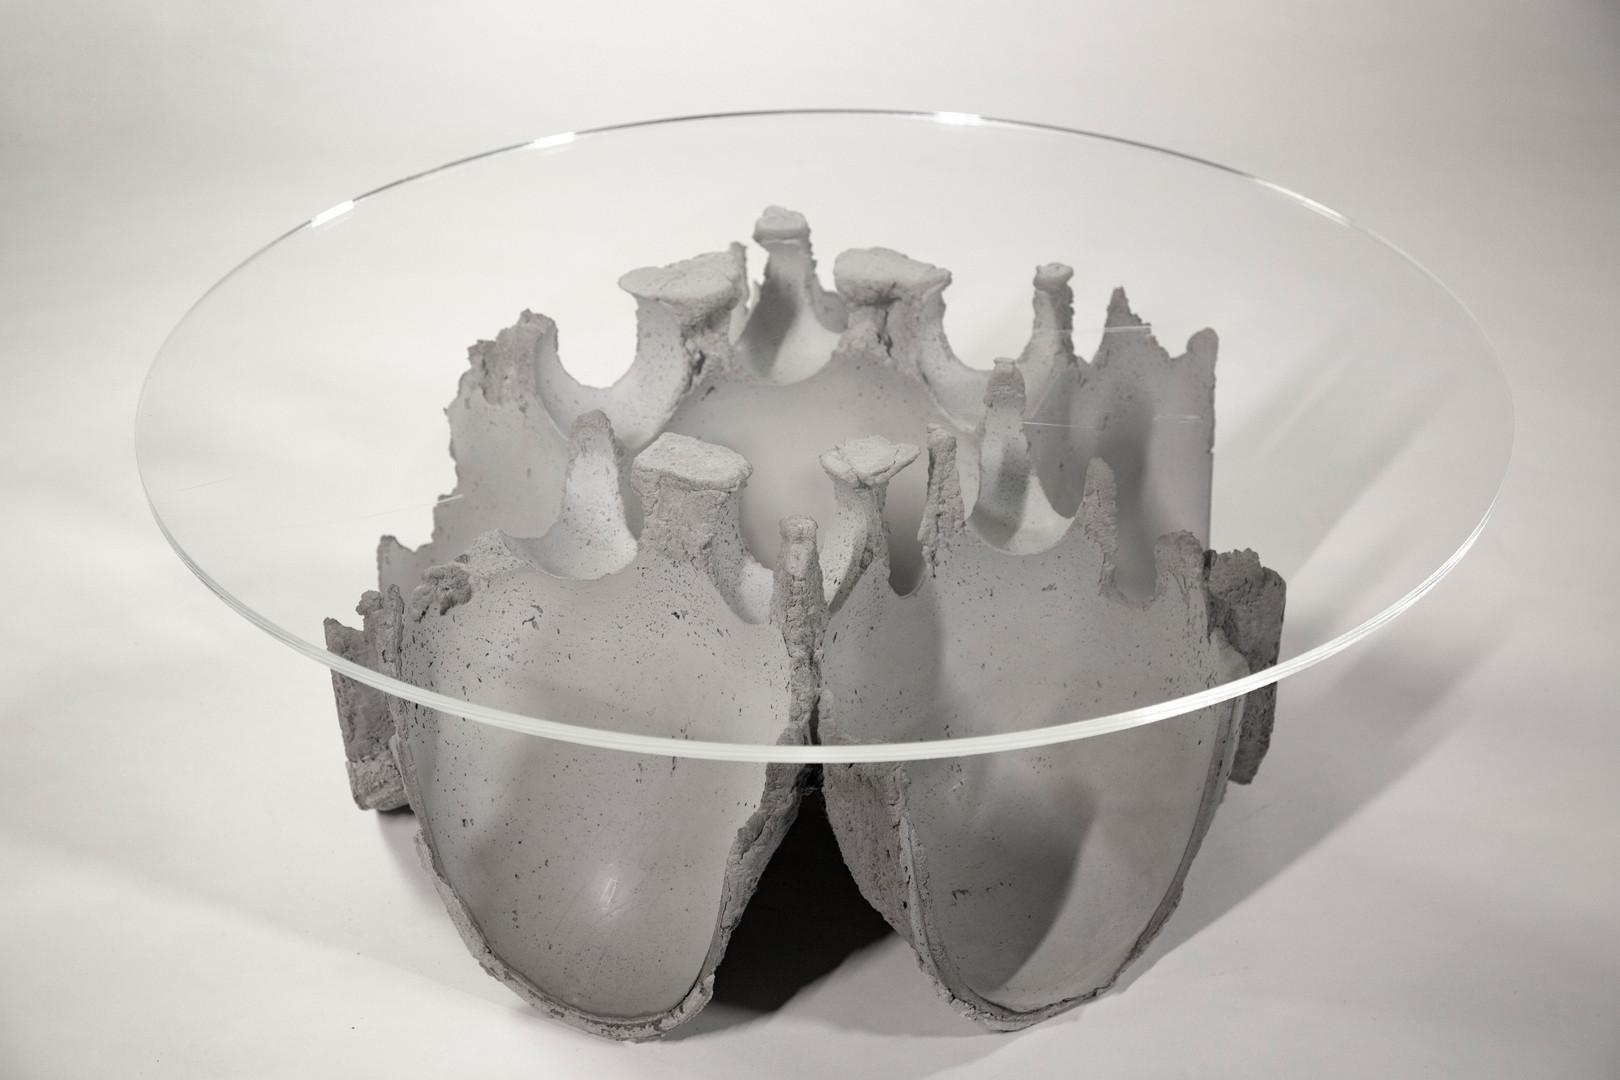 Wen-Xin Yeunh - infla-Table